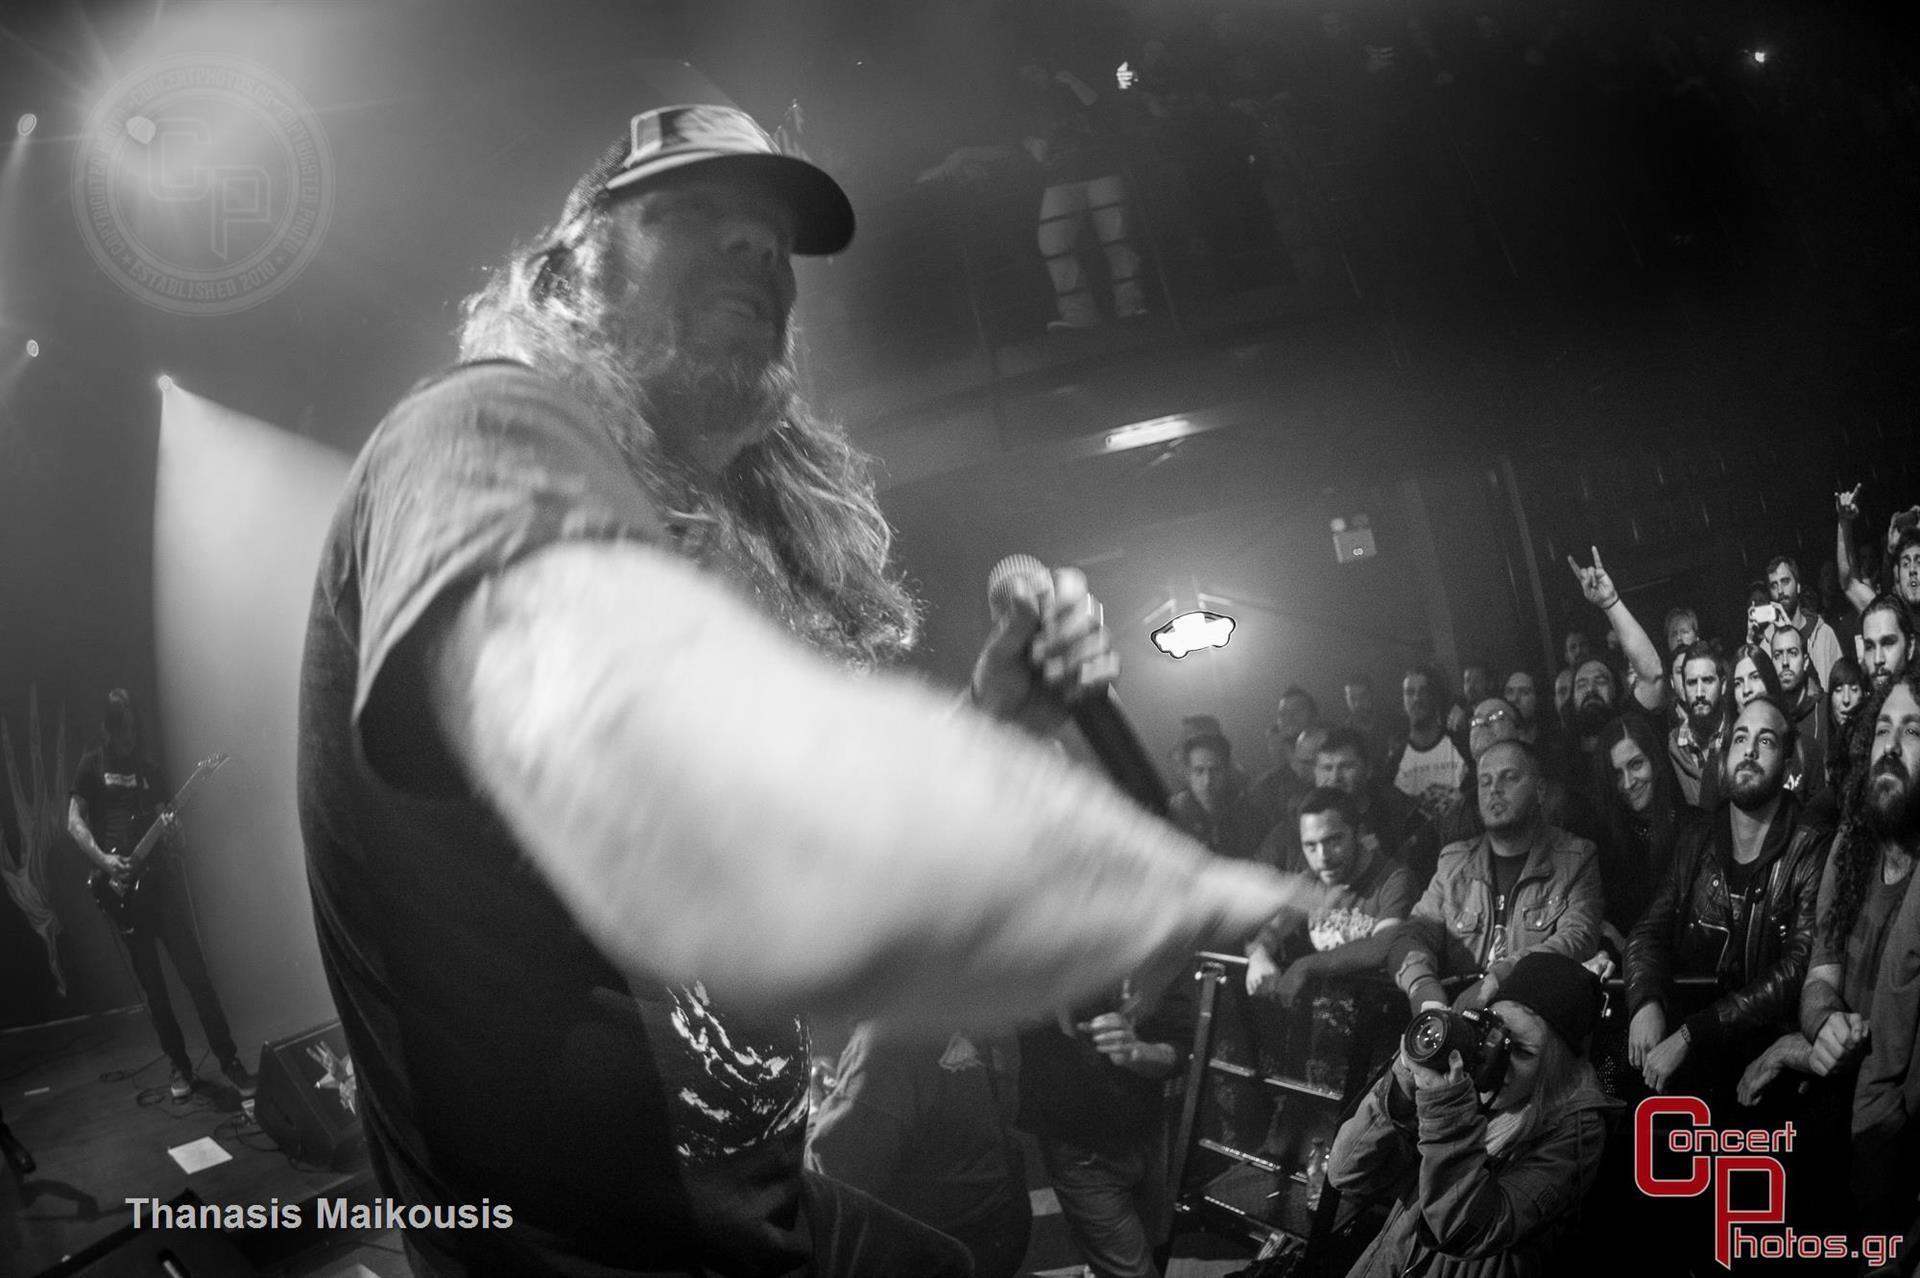 At The Gates-At The Gates Fuzz photographer: Thanasis Maikousis - ConcertPhotos - 20150109_2344_17